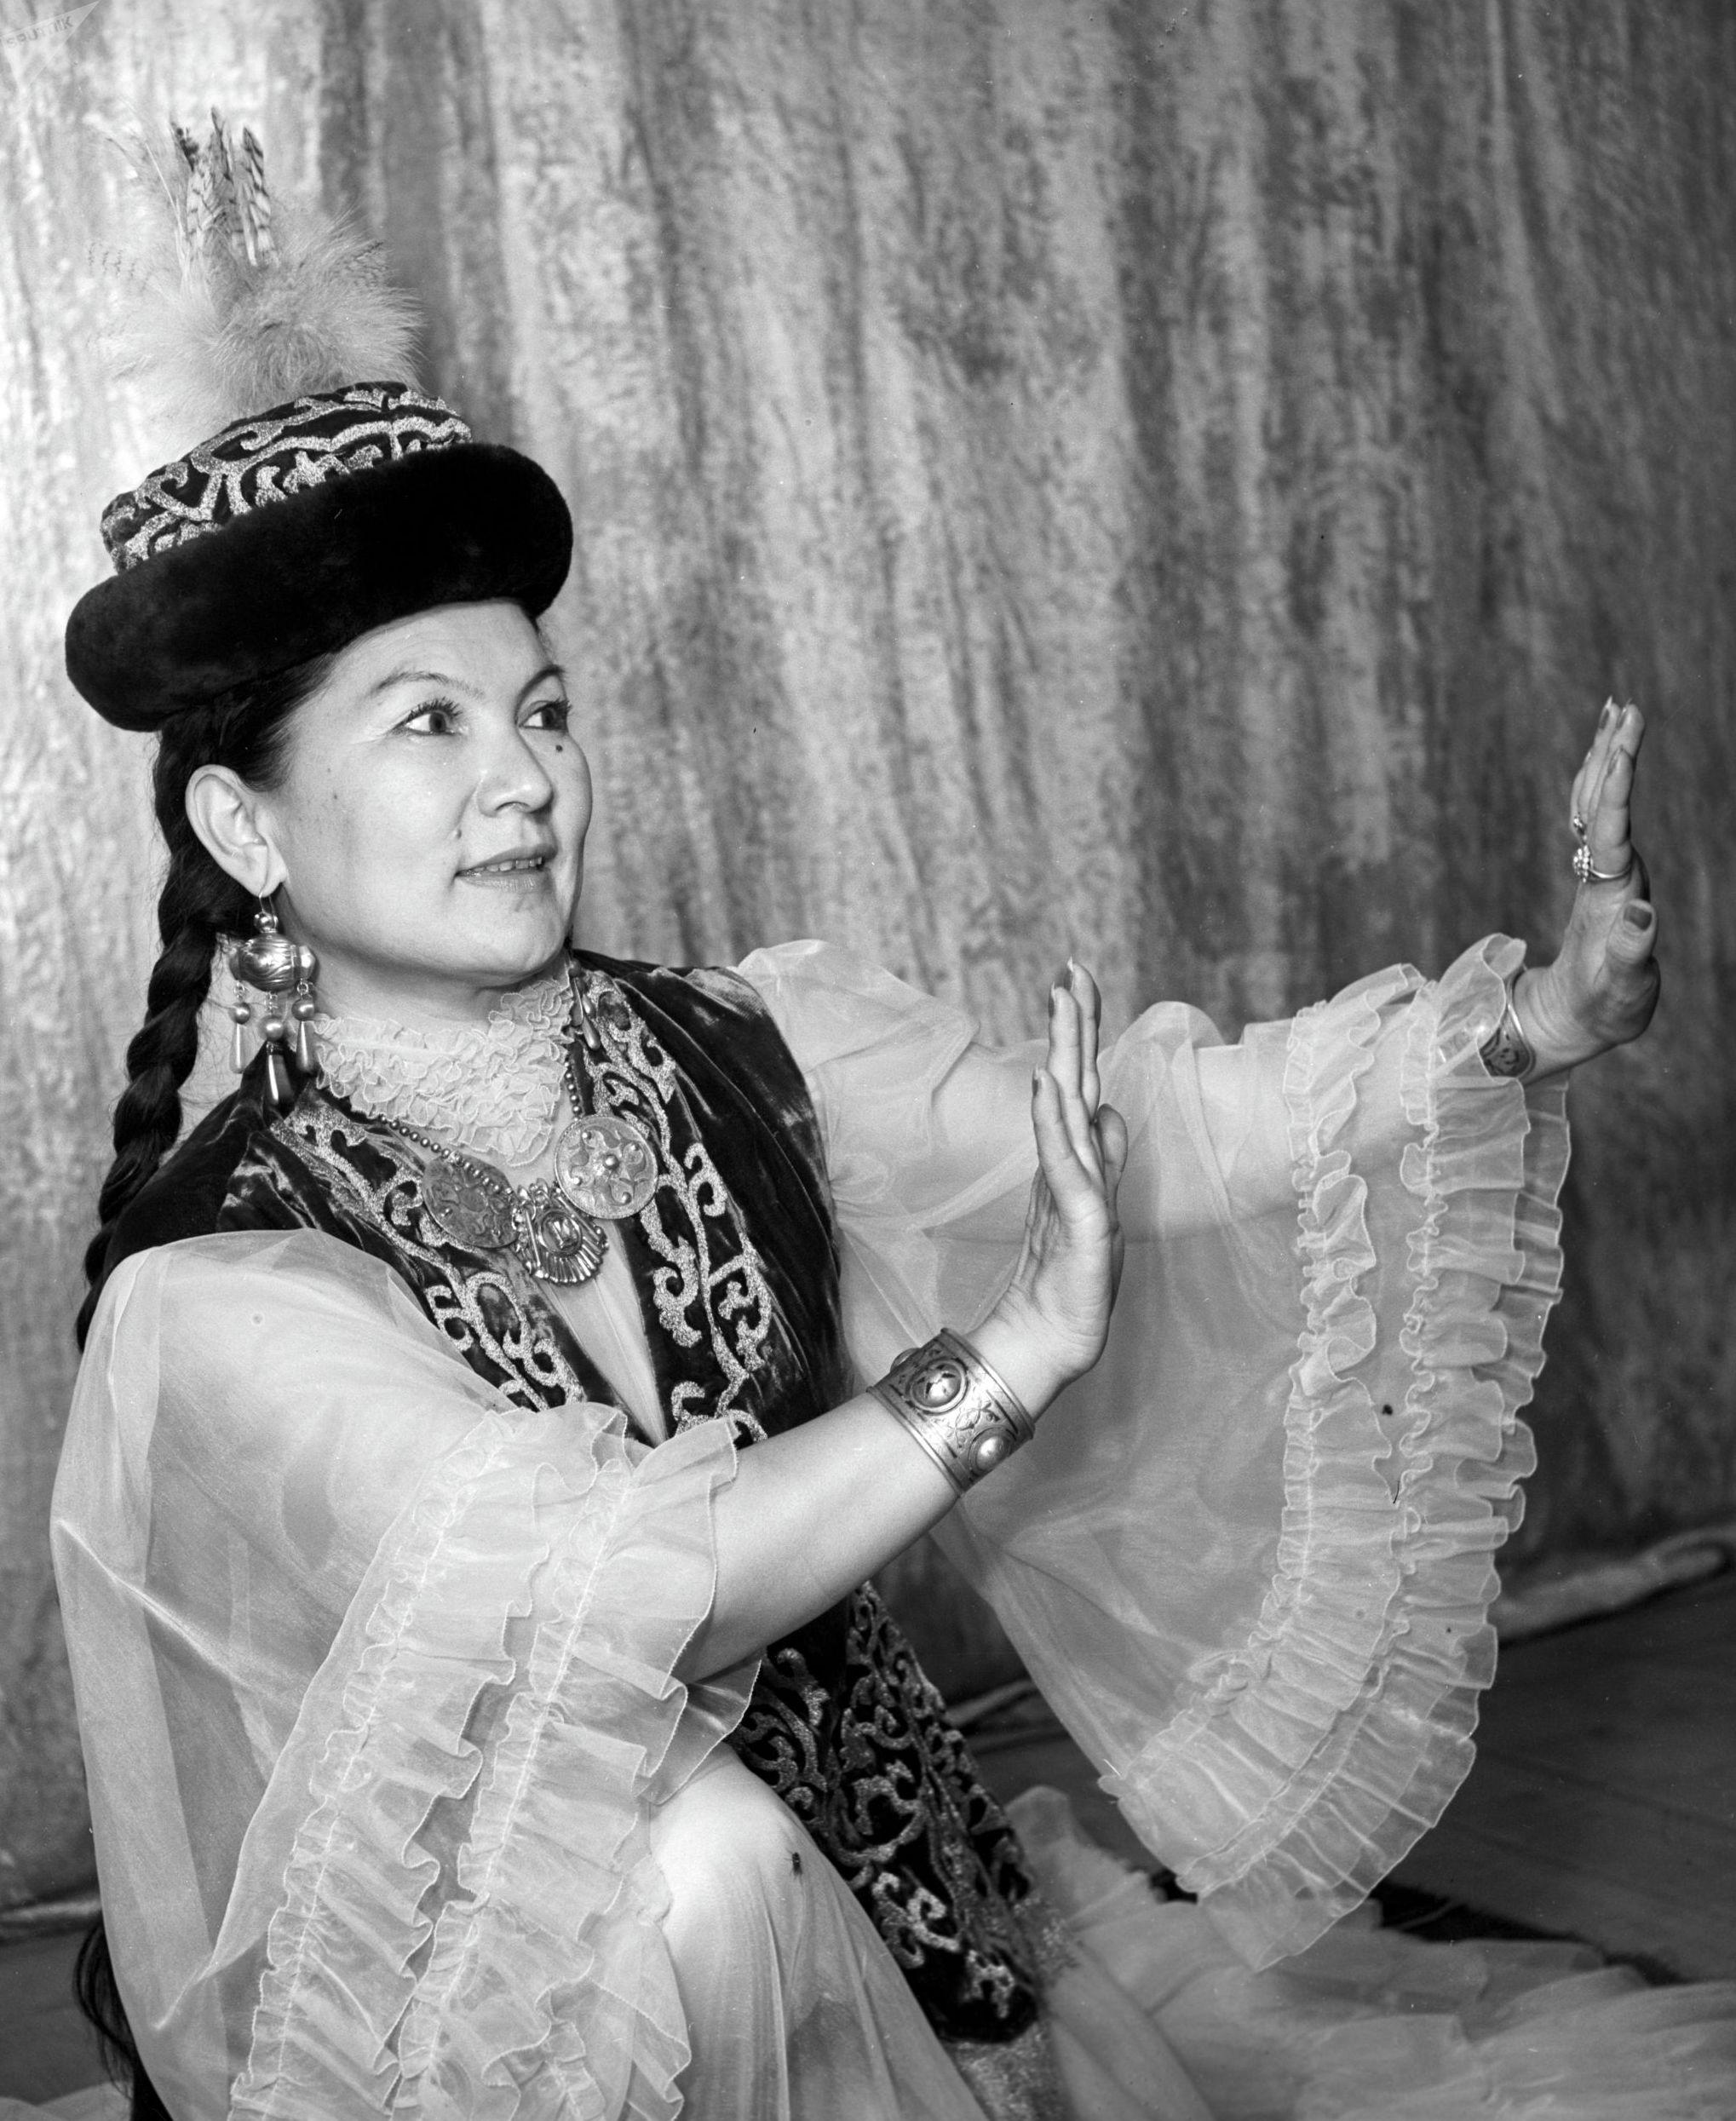 Народная артистка Казахской ССР Шара Жиенкулова